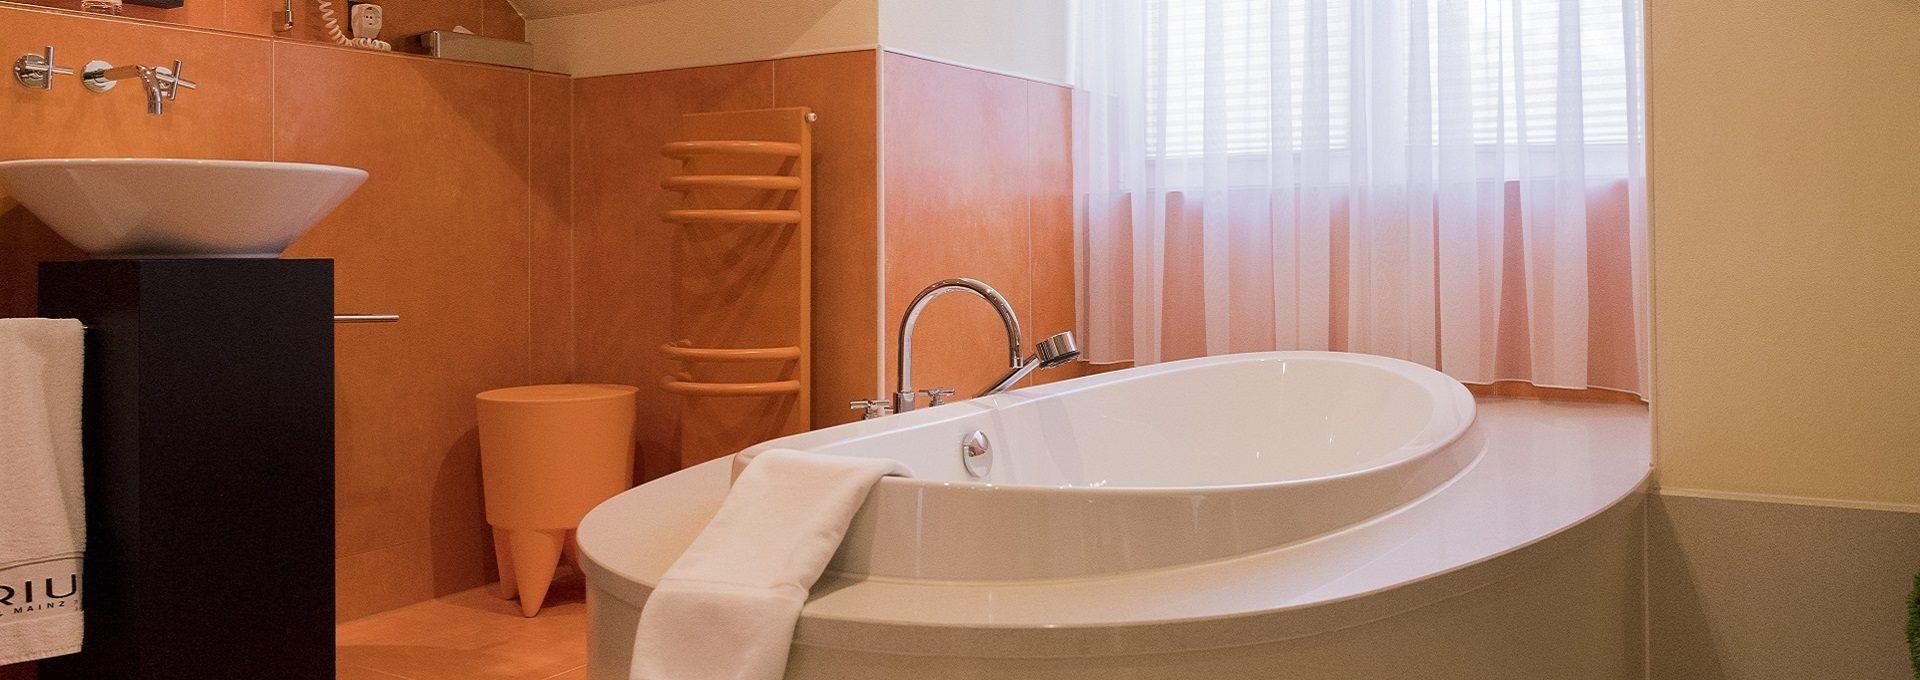 Aufnahme Badewanne